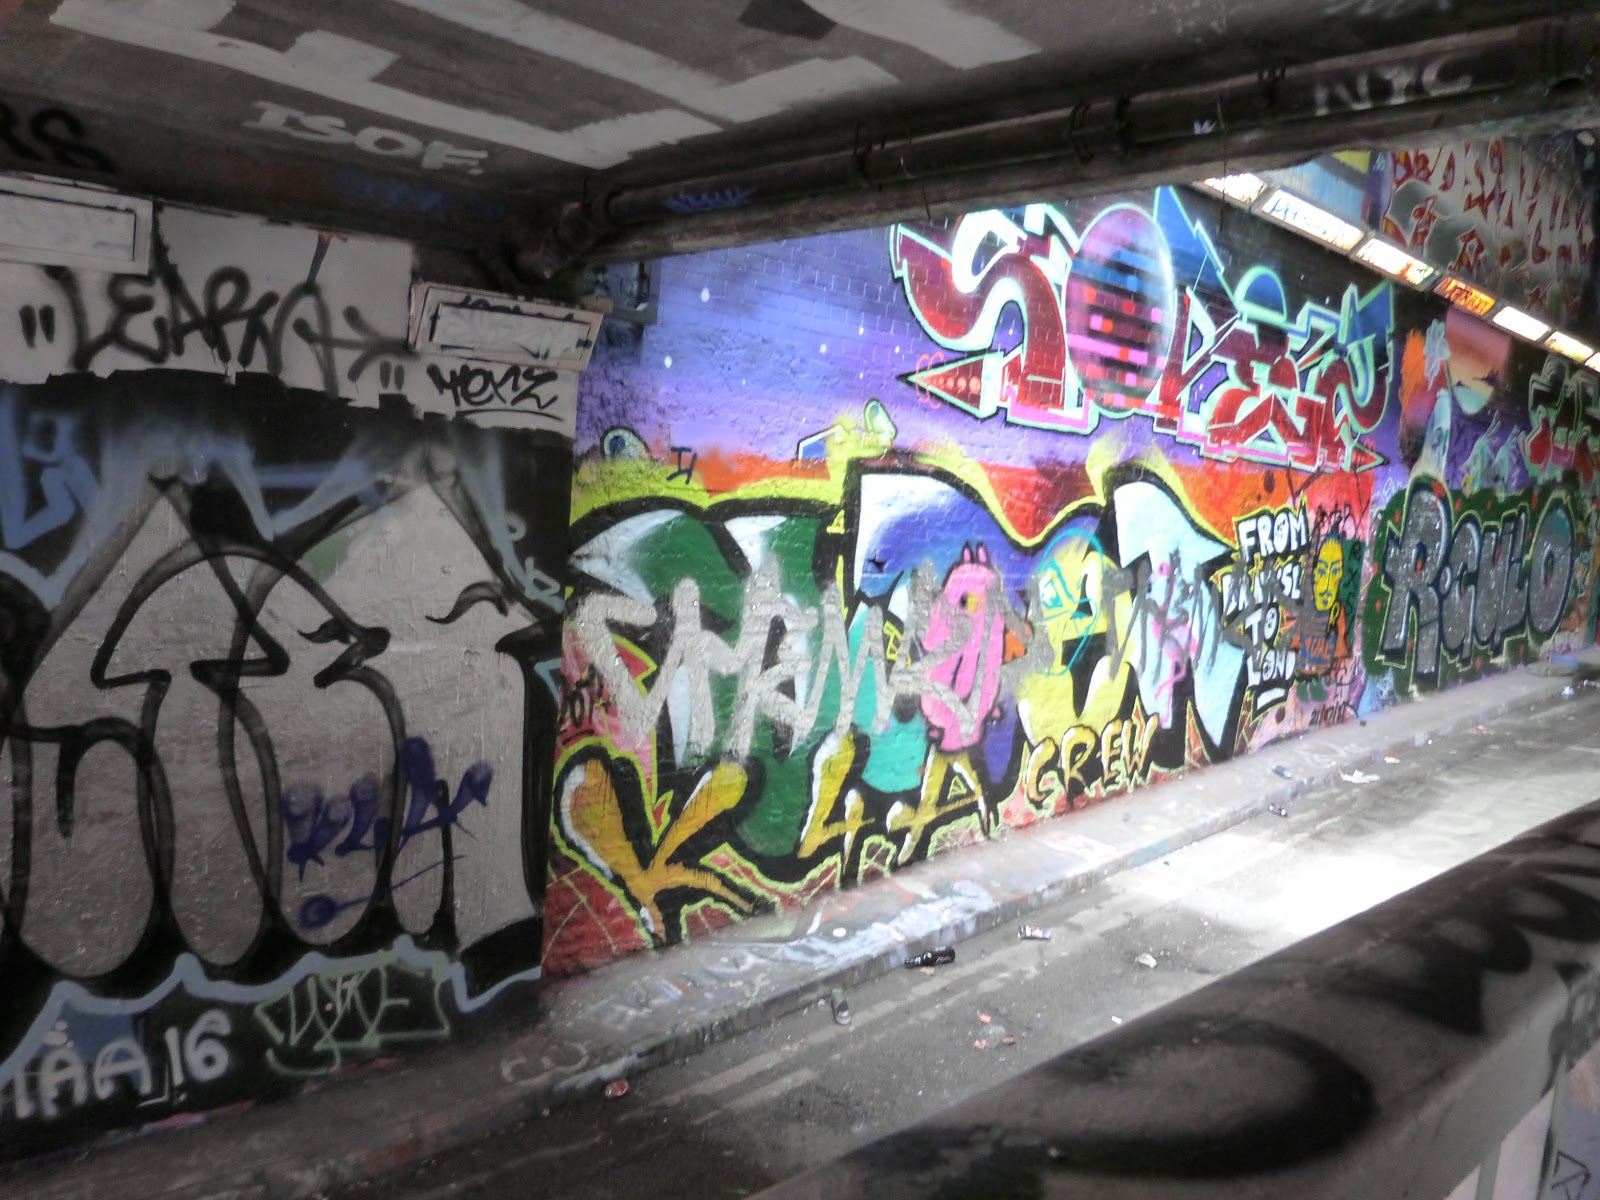 Things to do in London - Leake Street Graffiti Tunnel